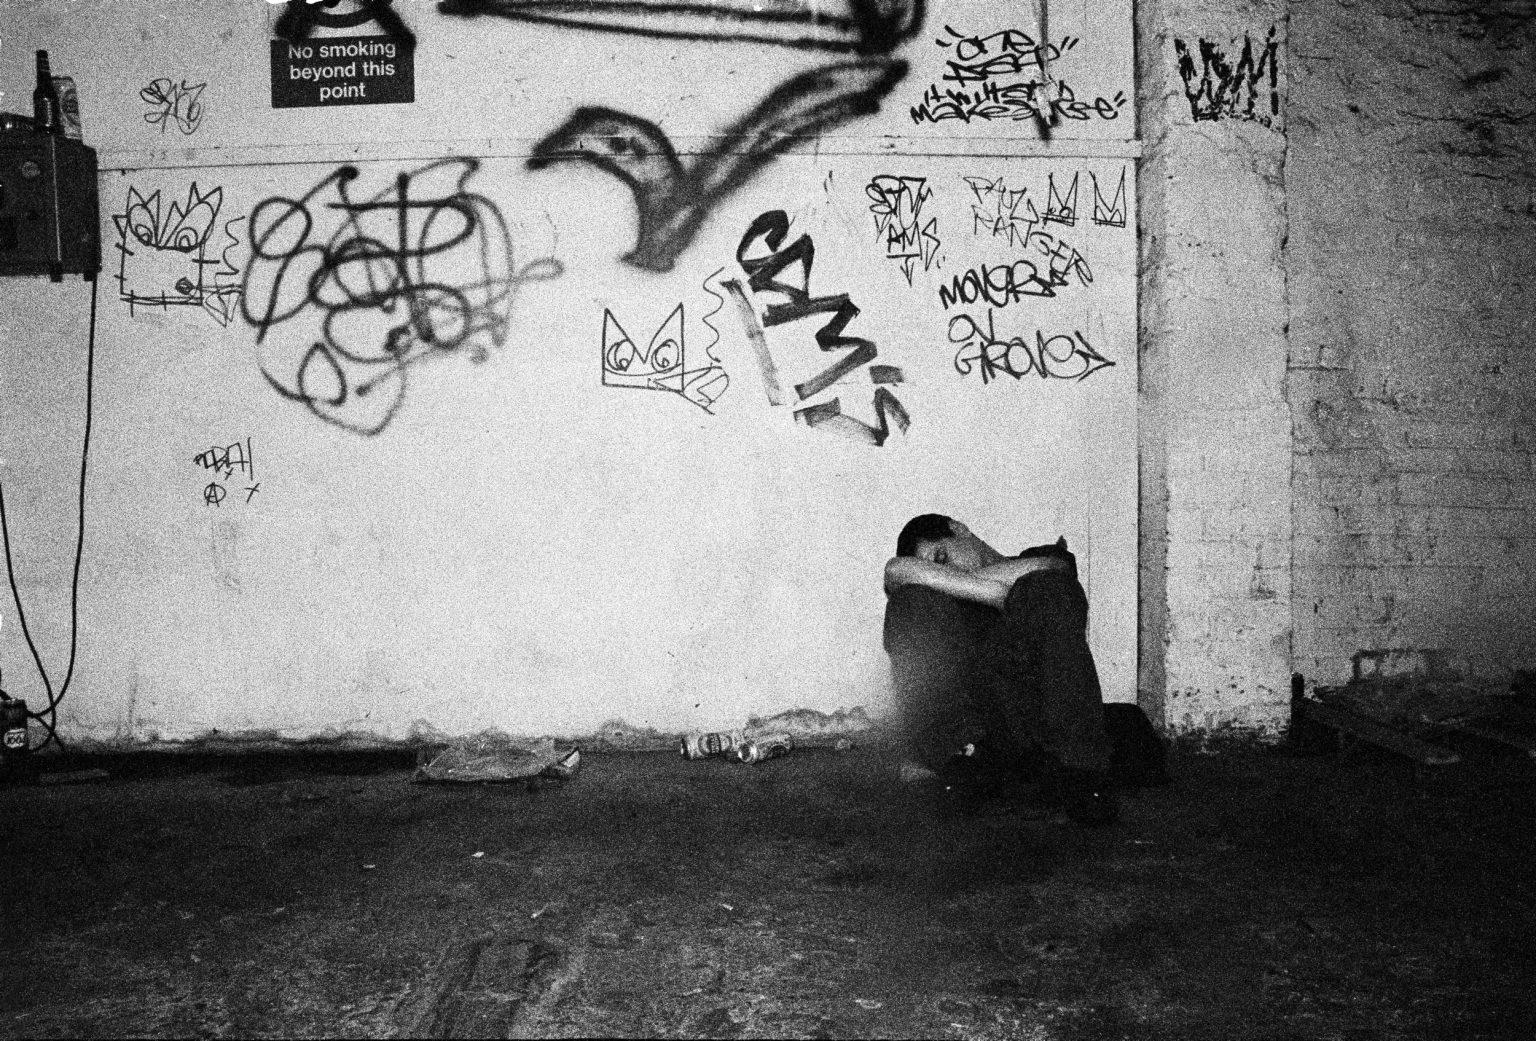 London, 2005 - Unknown Raver sleeping at a squat party in Shoreditch; right before the area became completely gentrified. These parties were different from the italian ones; the scene and the music being way tough. >< Londra, 2005 - Raver dorme a uno squat party a Shoreditch; poco prima che l'area diventasse completamente gentrificata. Queste feste erano diverse da quelle italiane; con un ambiente molto più duro.